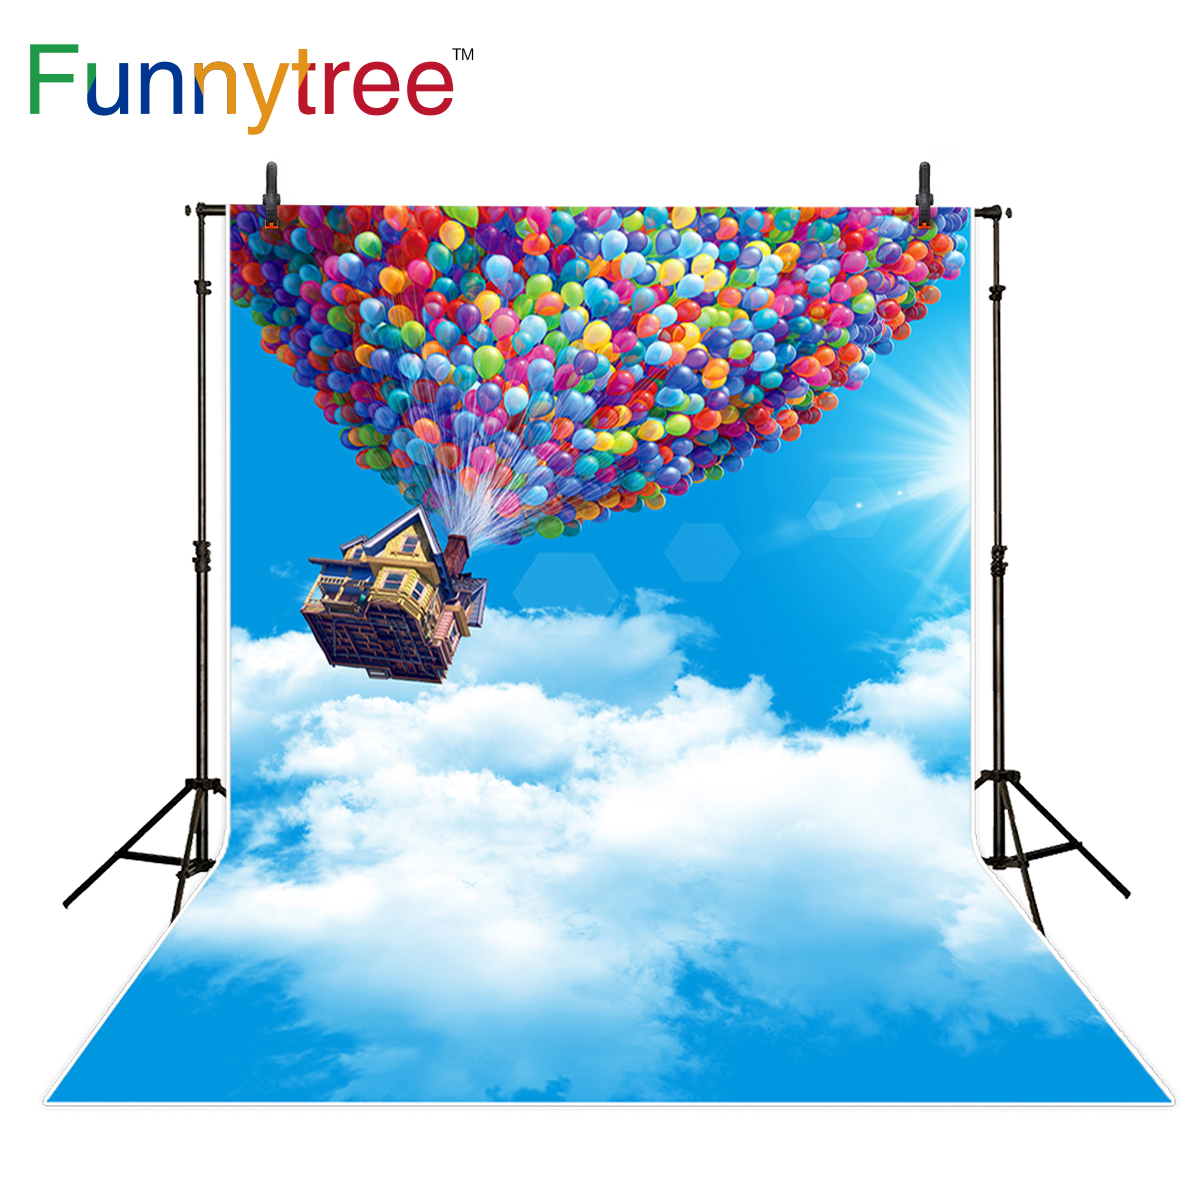 Funnytree photography background magic balloons house sky cloud sunshine fairy backdrop photocall photo studio customize vinyl photography background fairy tale